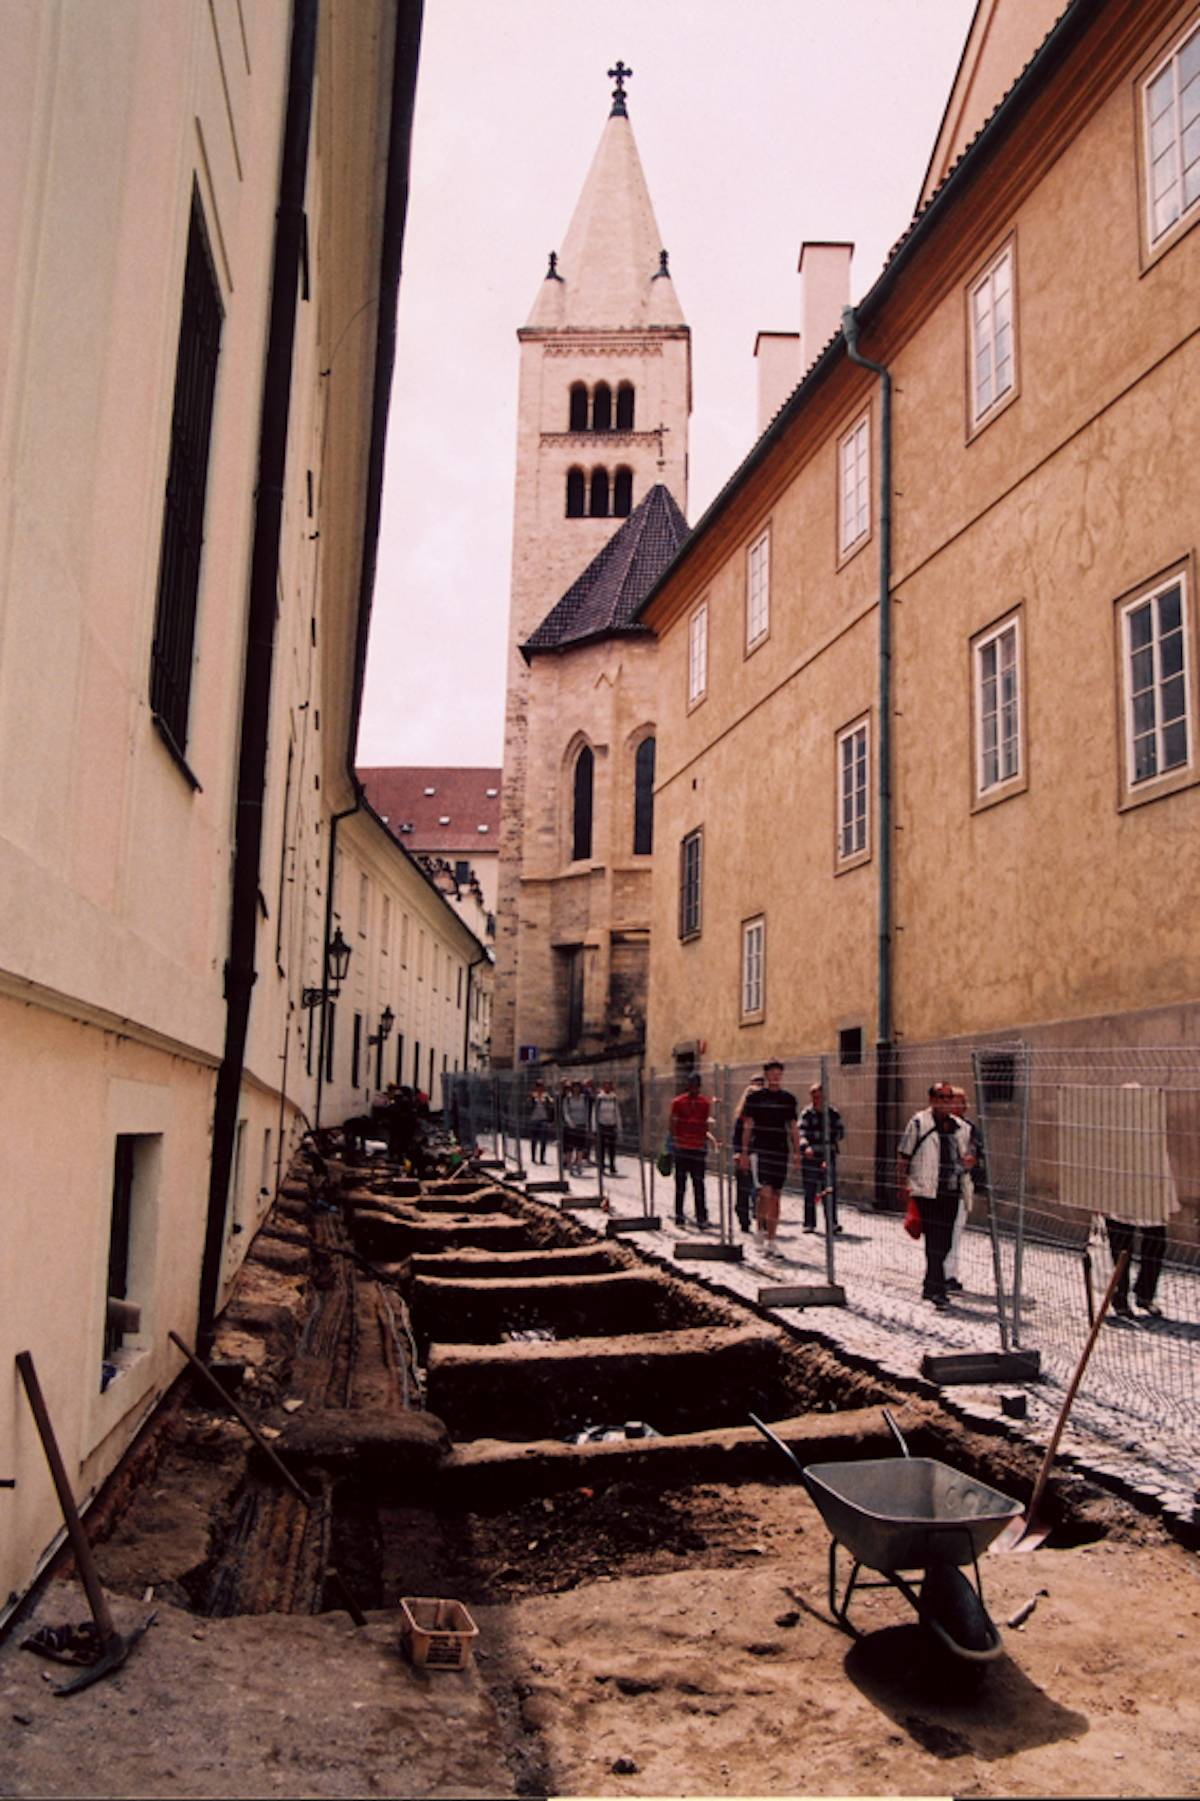 Pražský hrad ulice Jirská rekonstrukce IS Mercator s.r.o. Praha